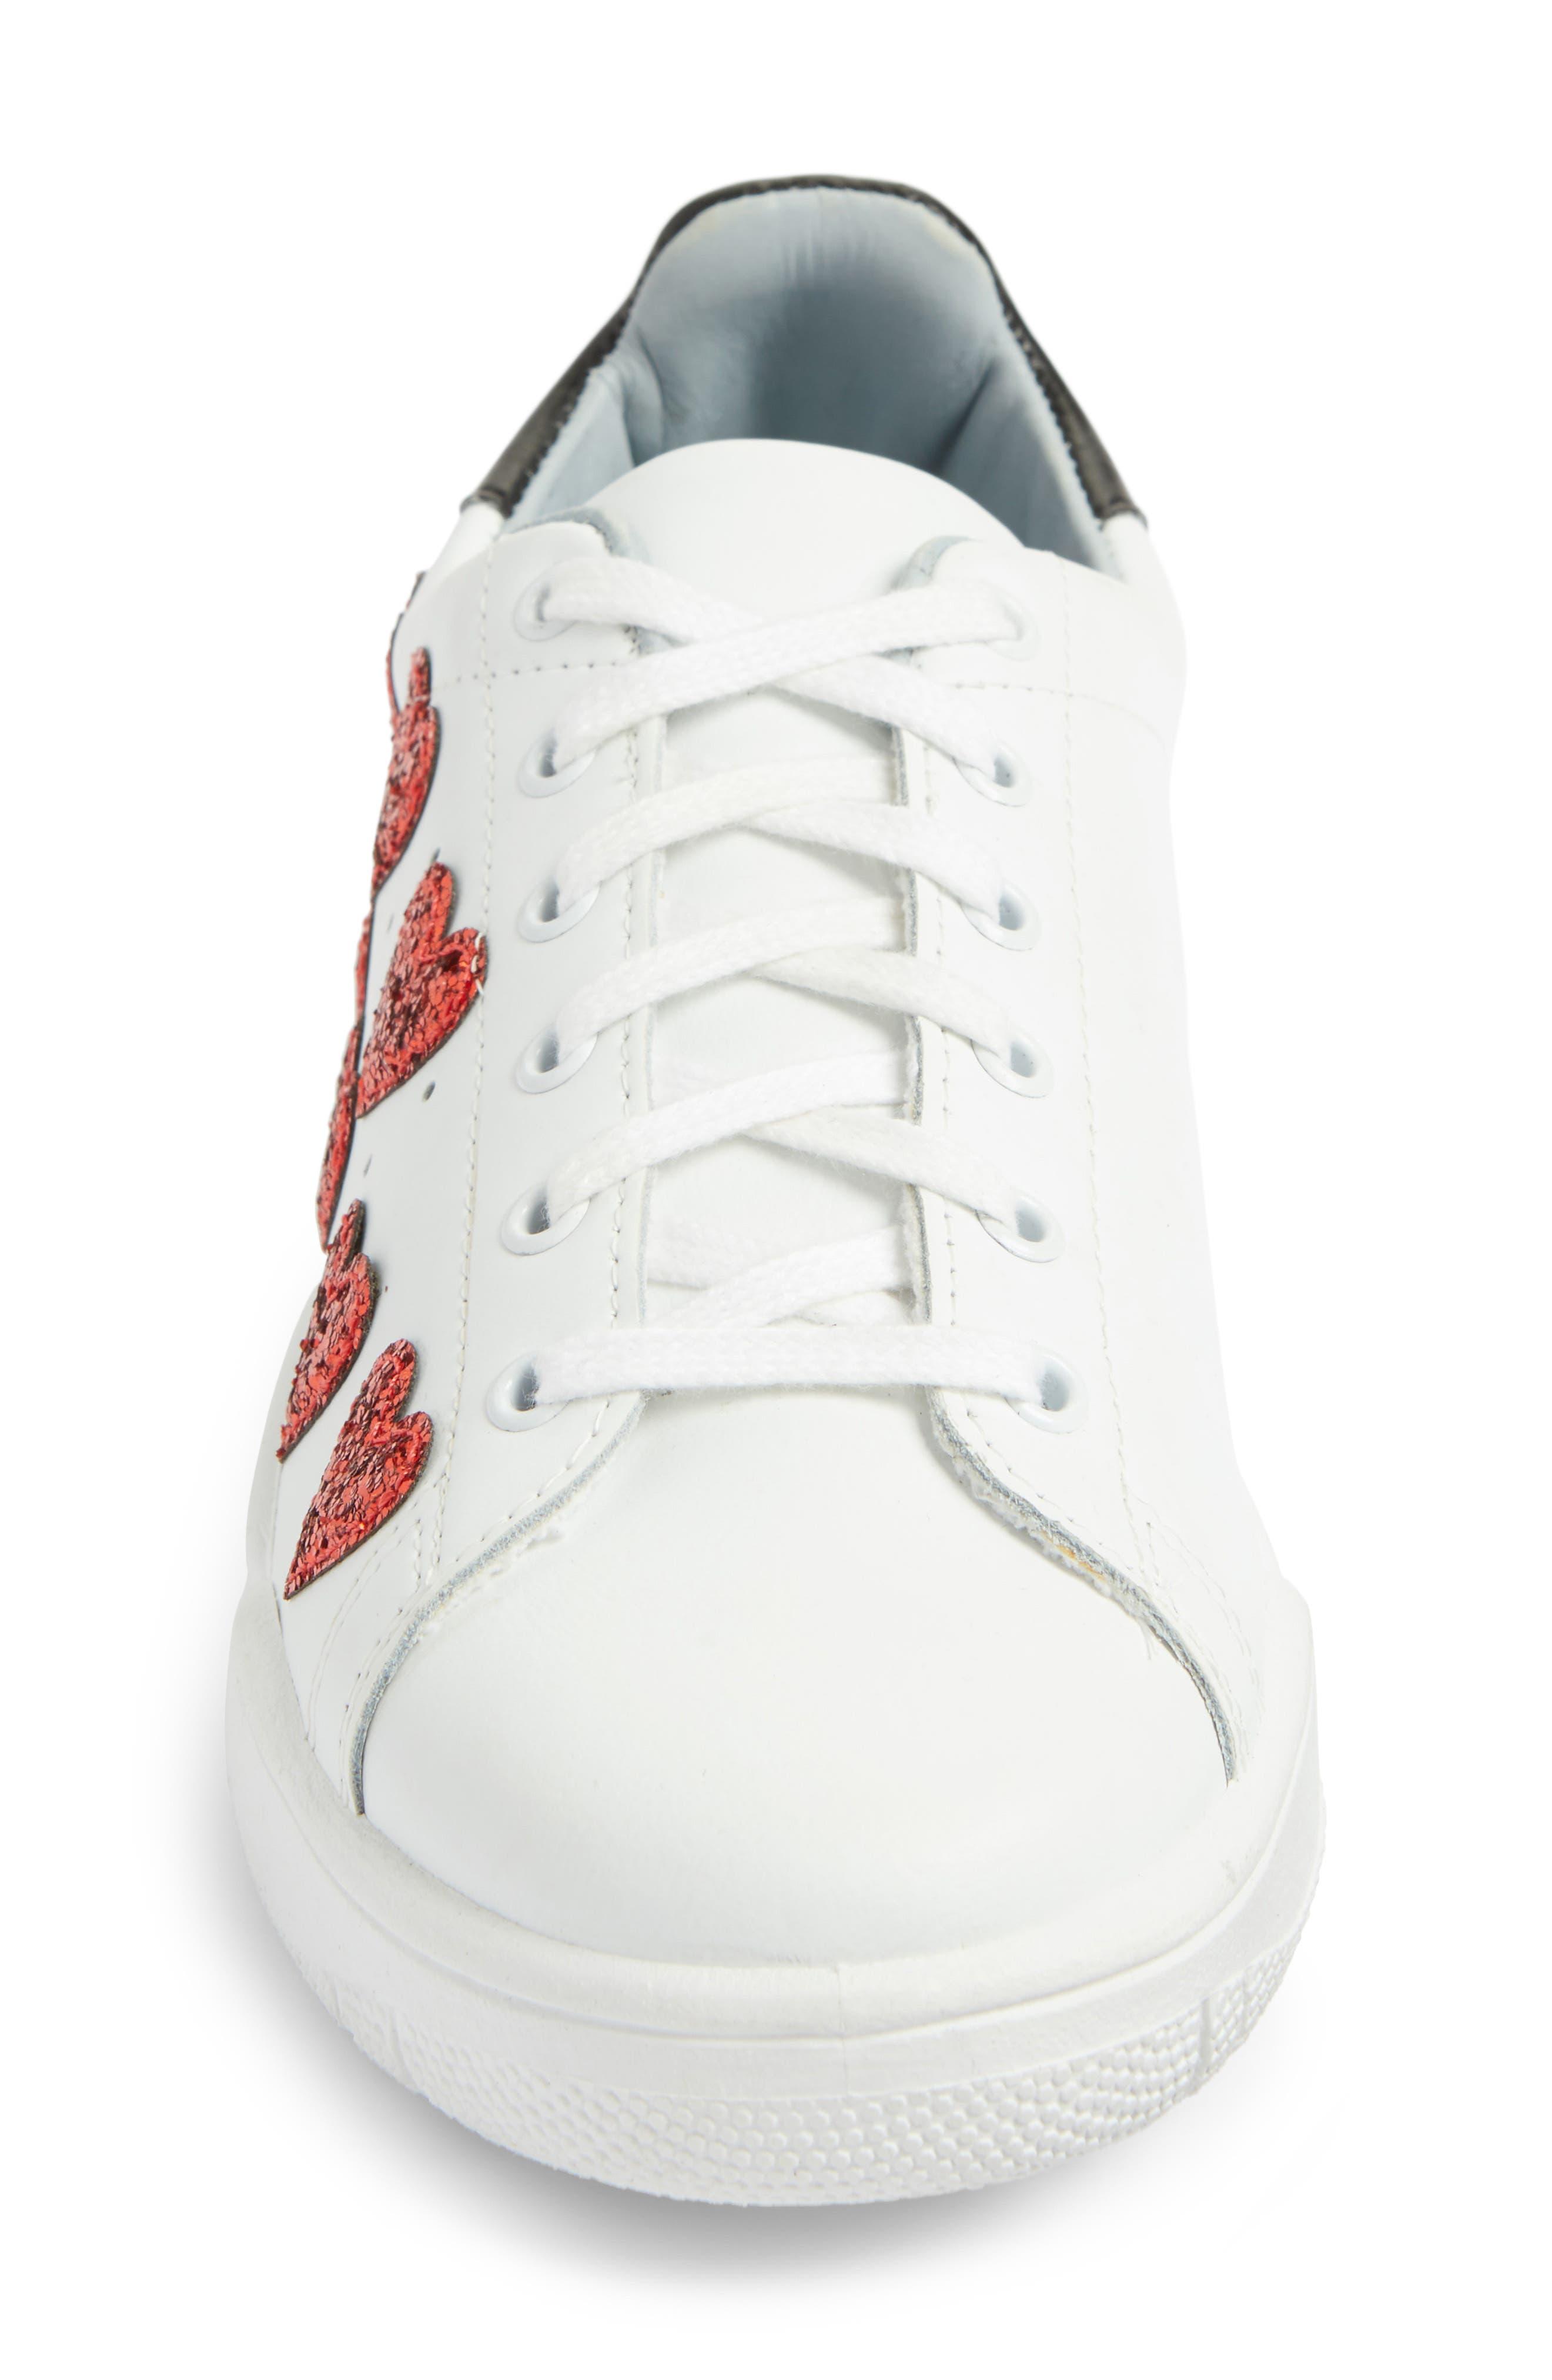 Hearts Roger Sneaker,                             Alternate thumbnail 4, color,                             White/ Red